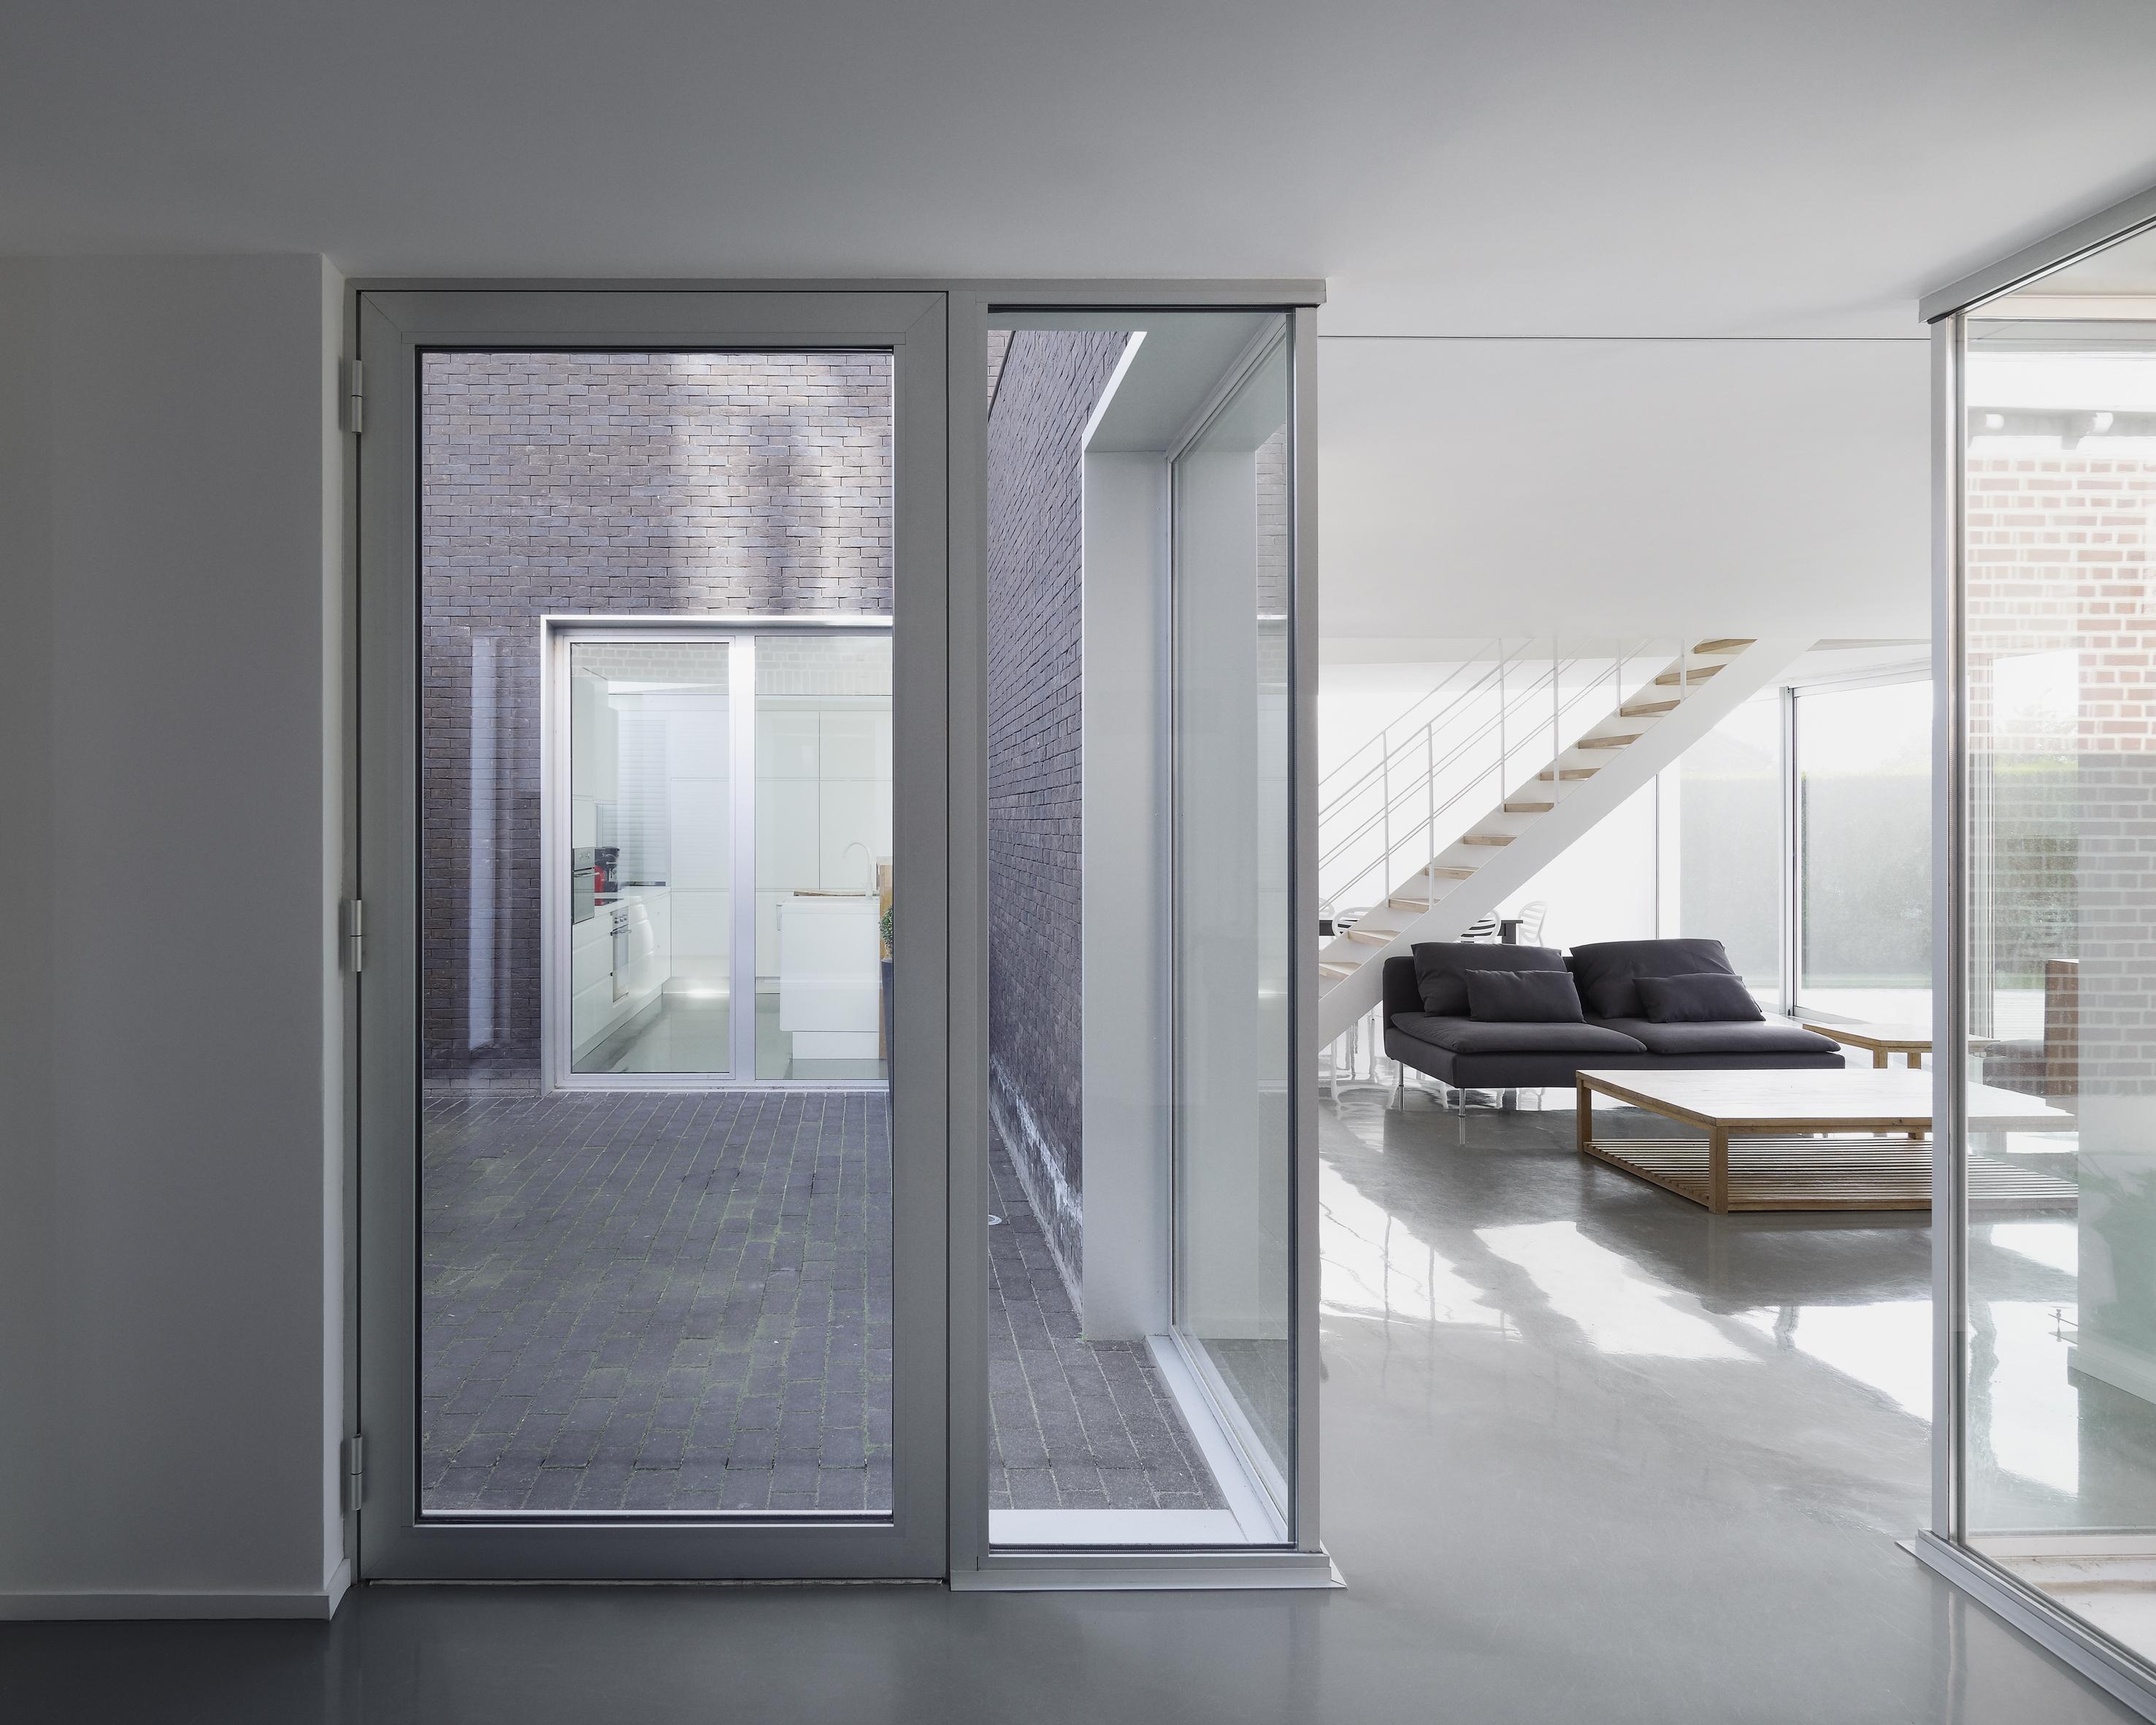 Porte fen tre aluminium technal for Porte fenetre arrondie